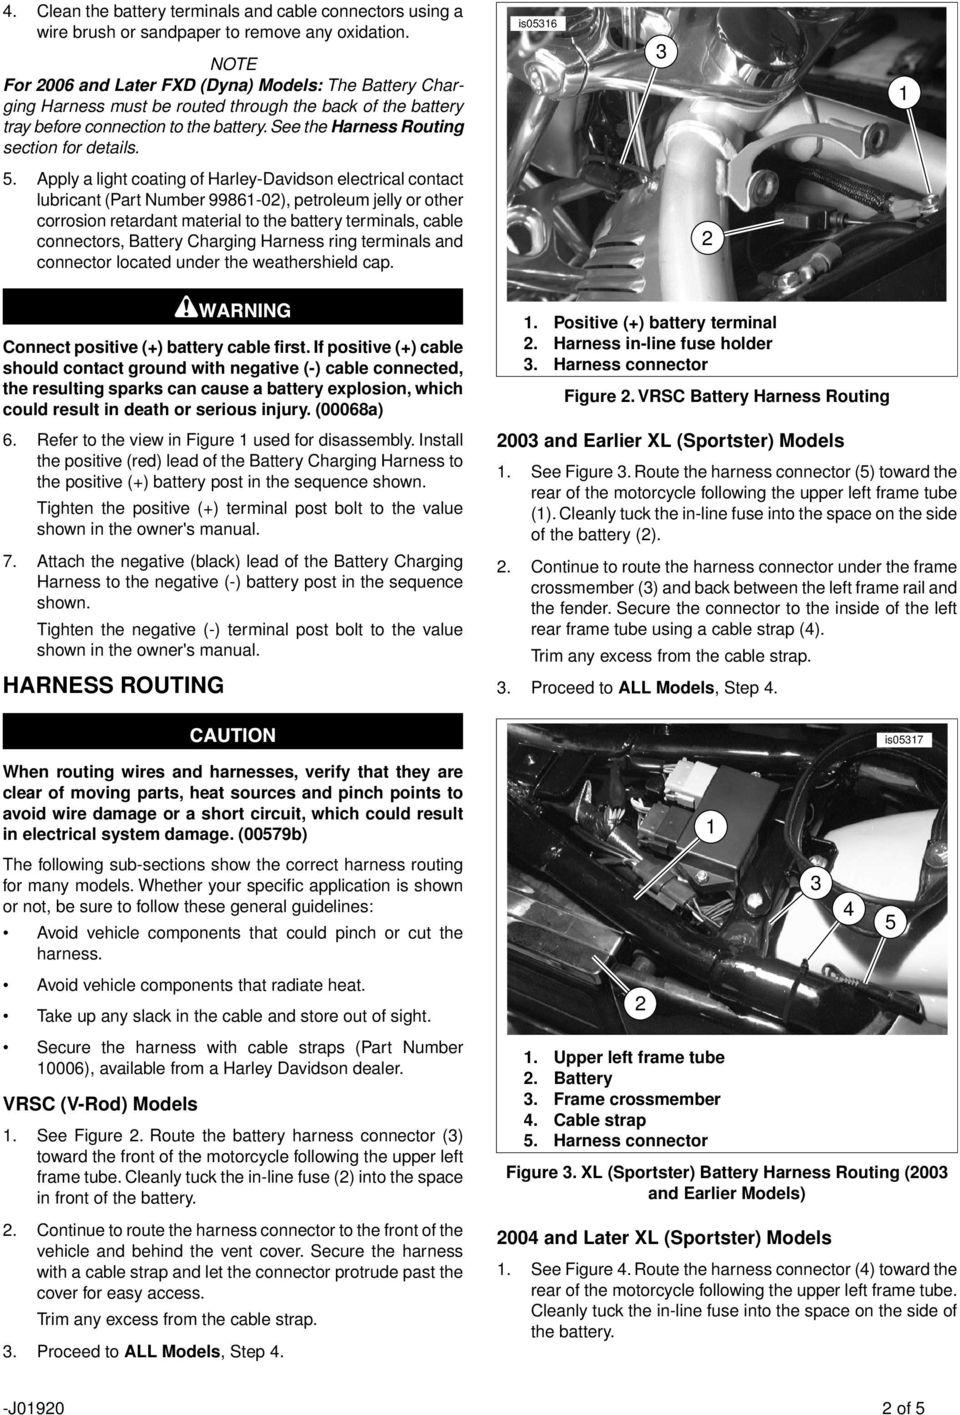 hight resolution of harley wiring harness diagram cobra wiring harness harley softail wiring harness mitsubishi wiring